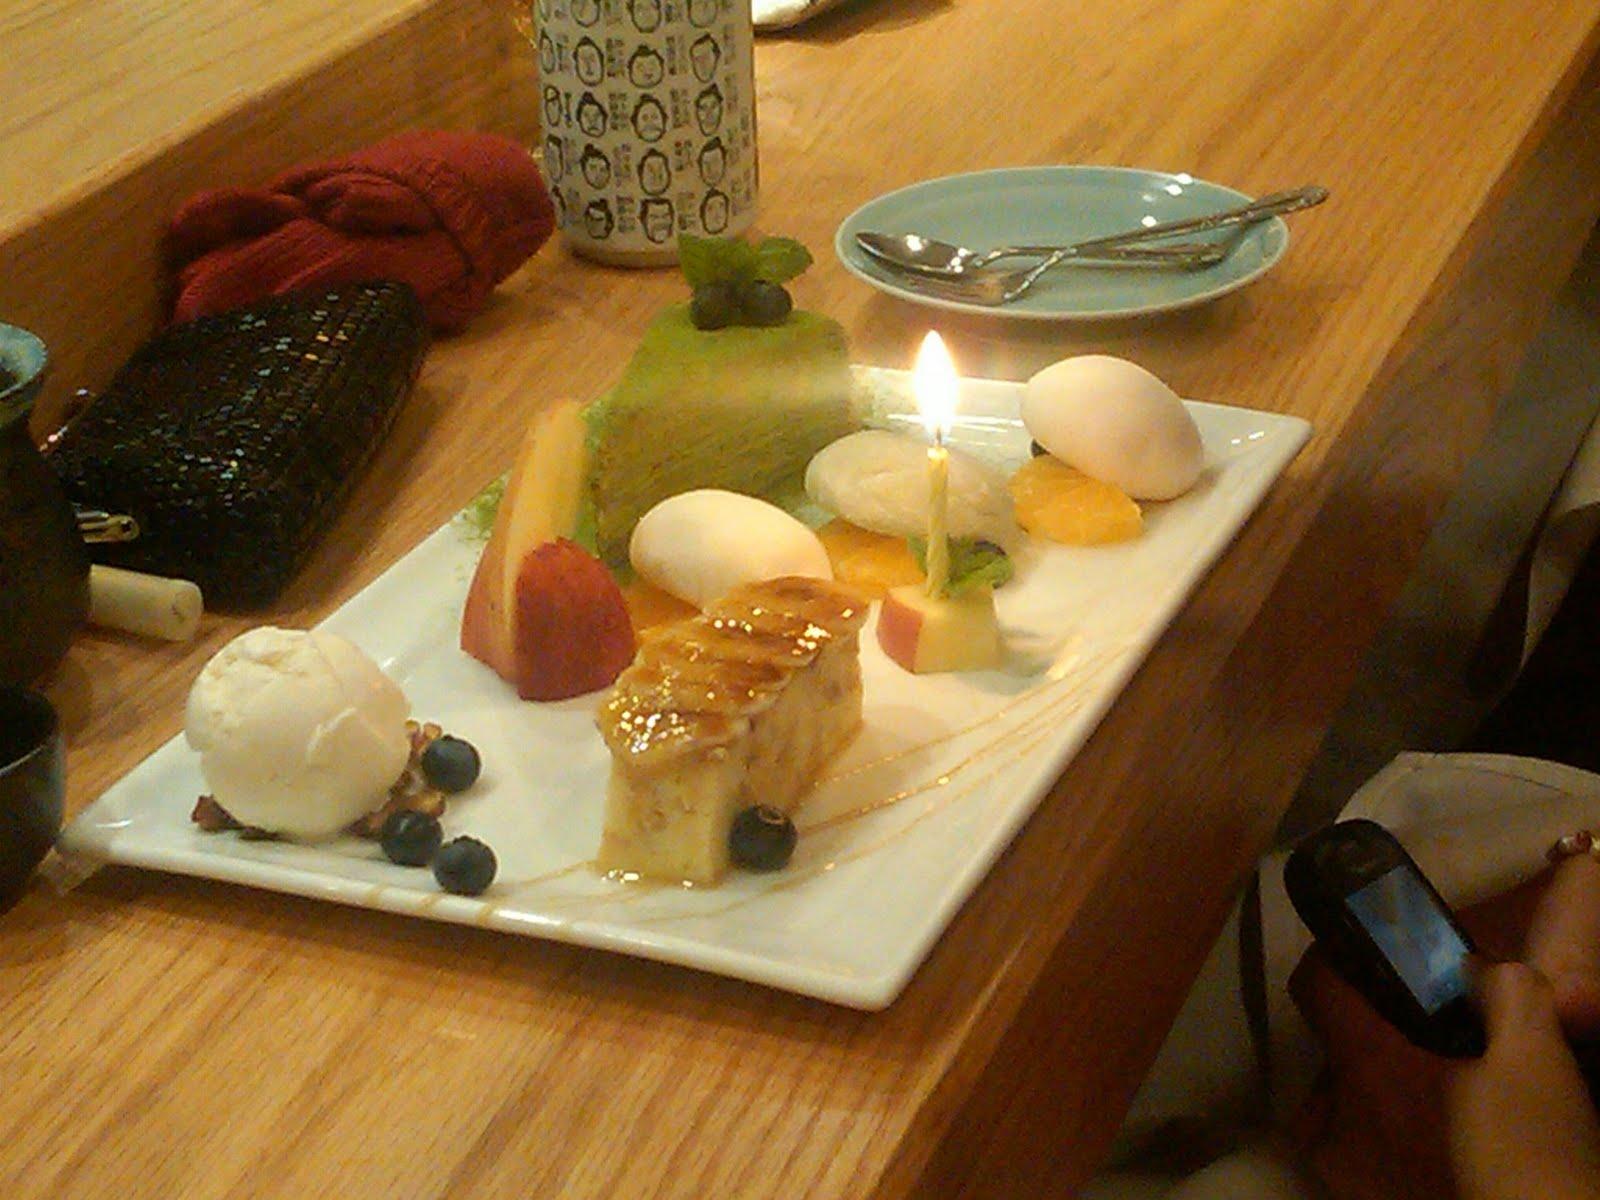 http://4.bp.blogspot.com/_wdB1oooXk-c/TOmsVxp1pLI/AAAAAAAAAng/gUXb3Kq3Gx8/s1600/Sushi%252Bof%252BGari%252Bbirthday%252Bdessert.jpg